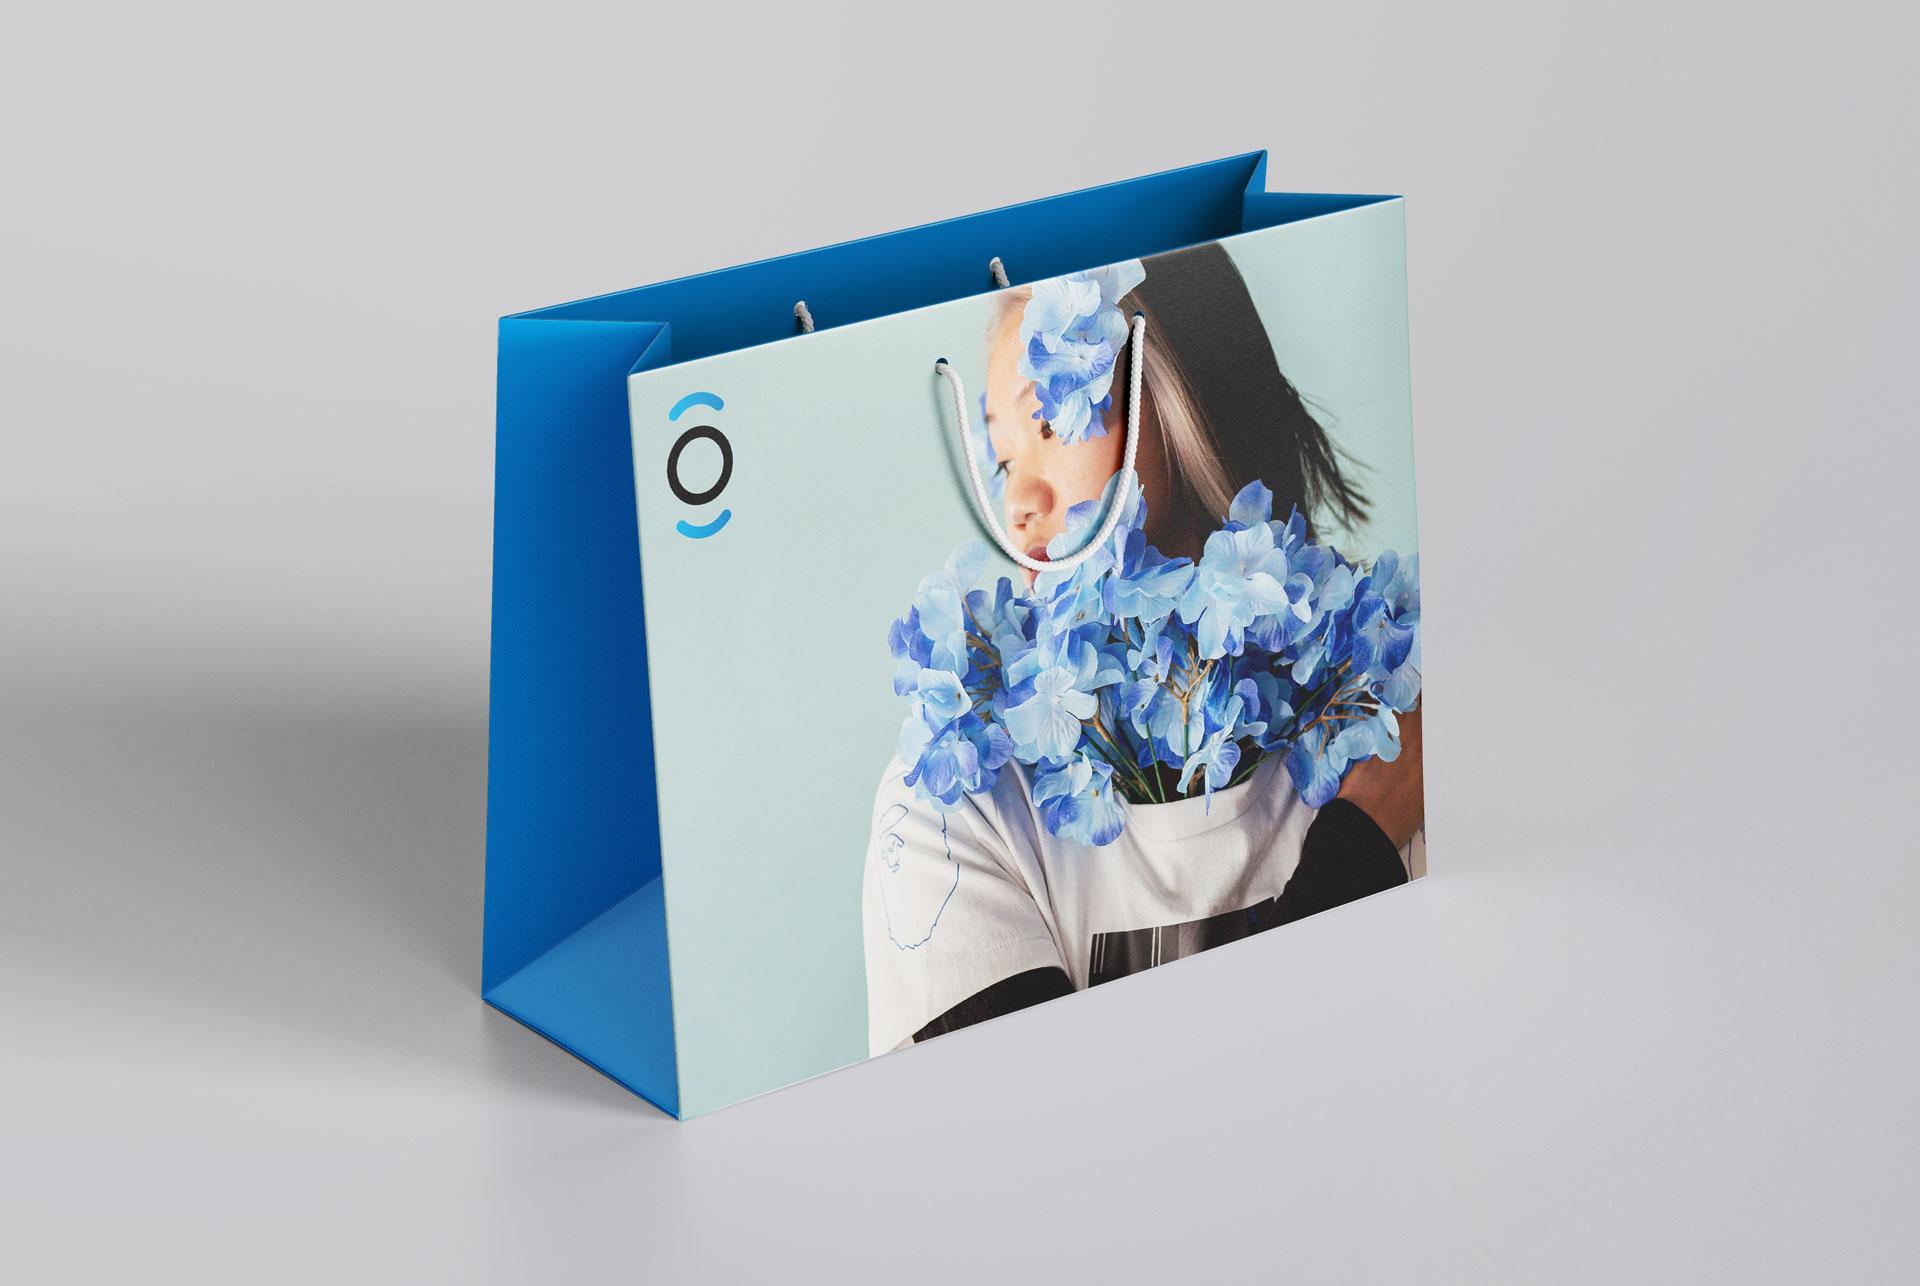 Xfin_mob_layout_bag-3